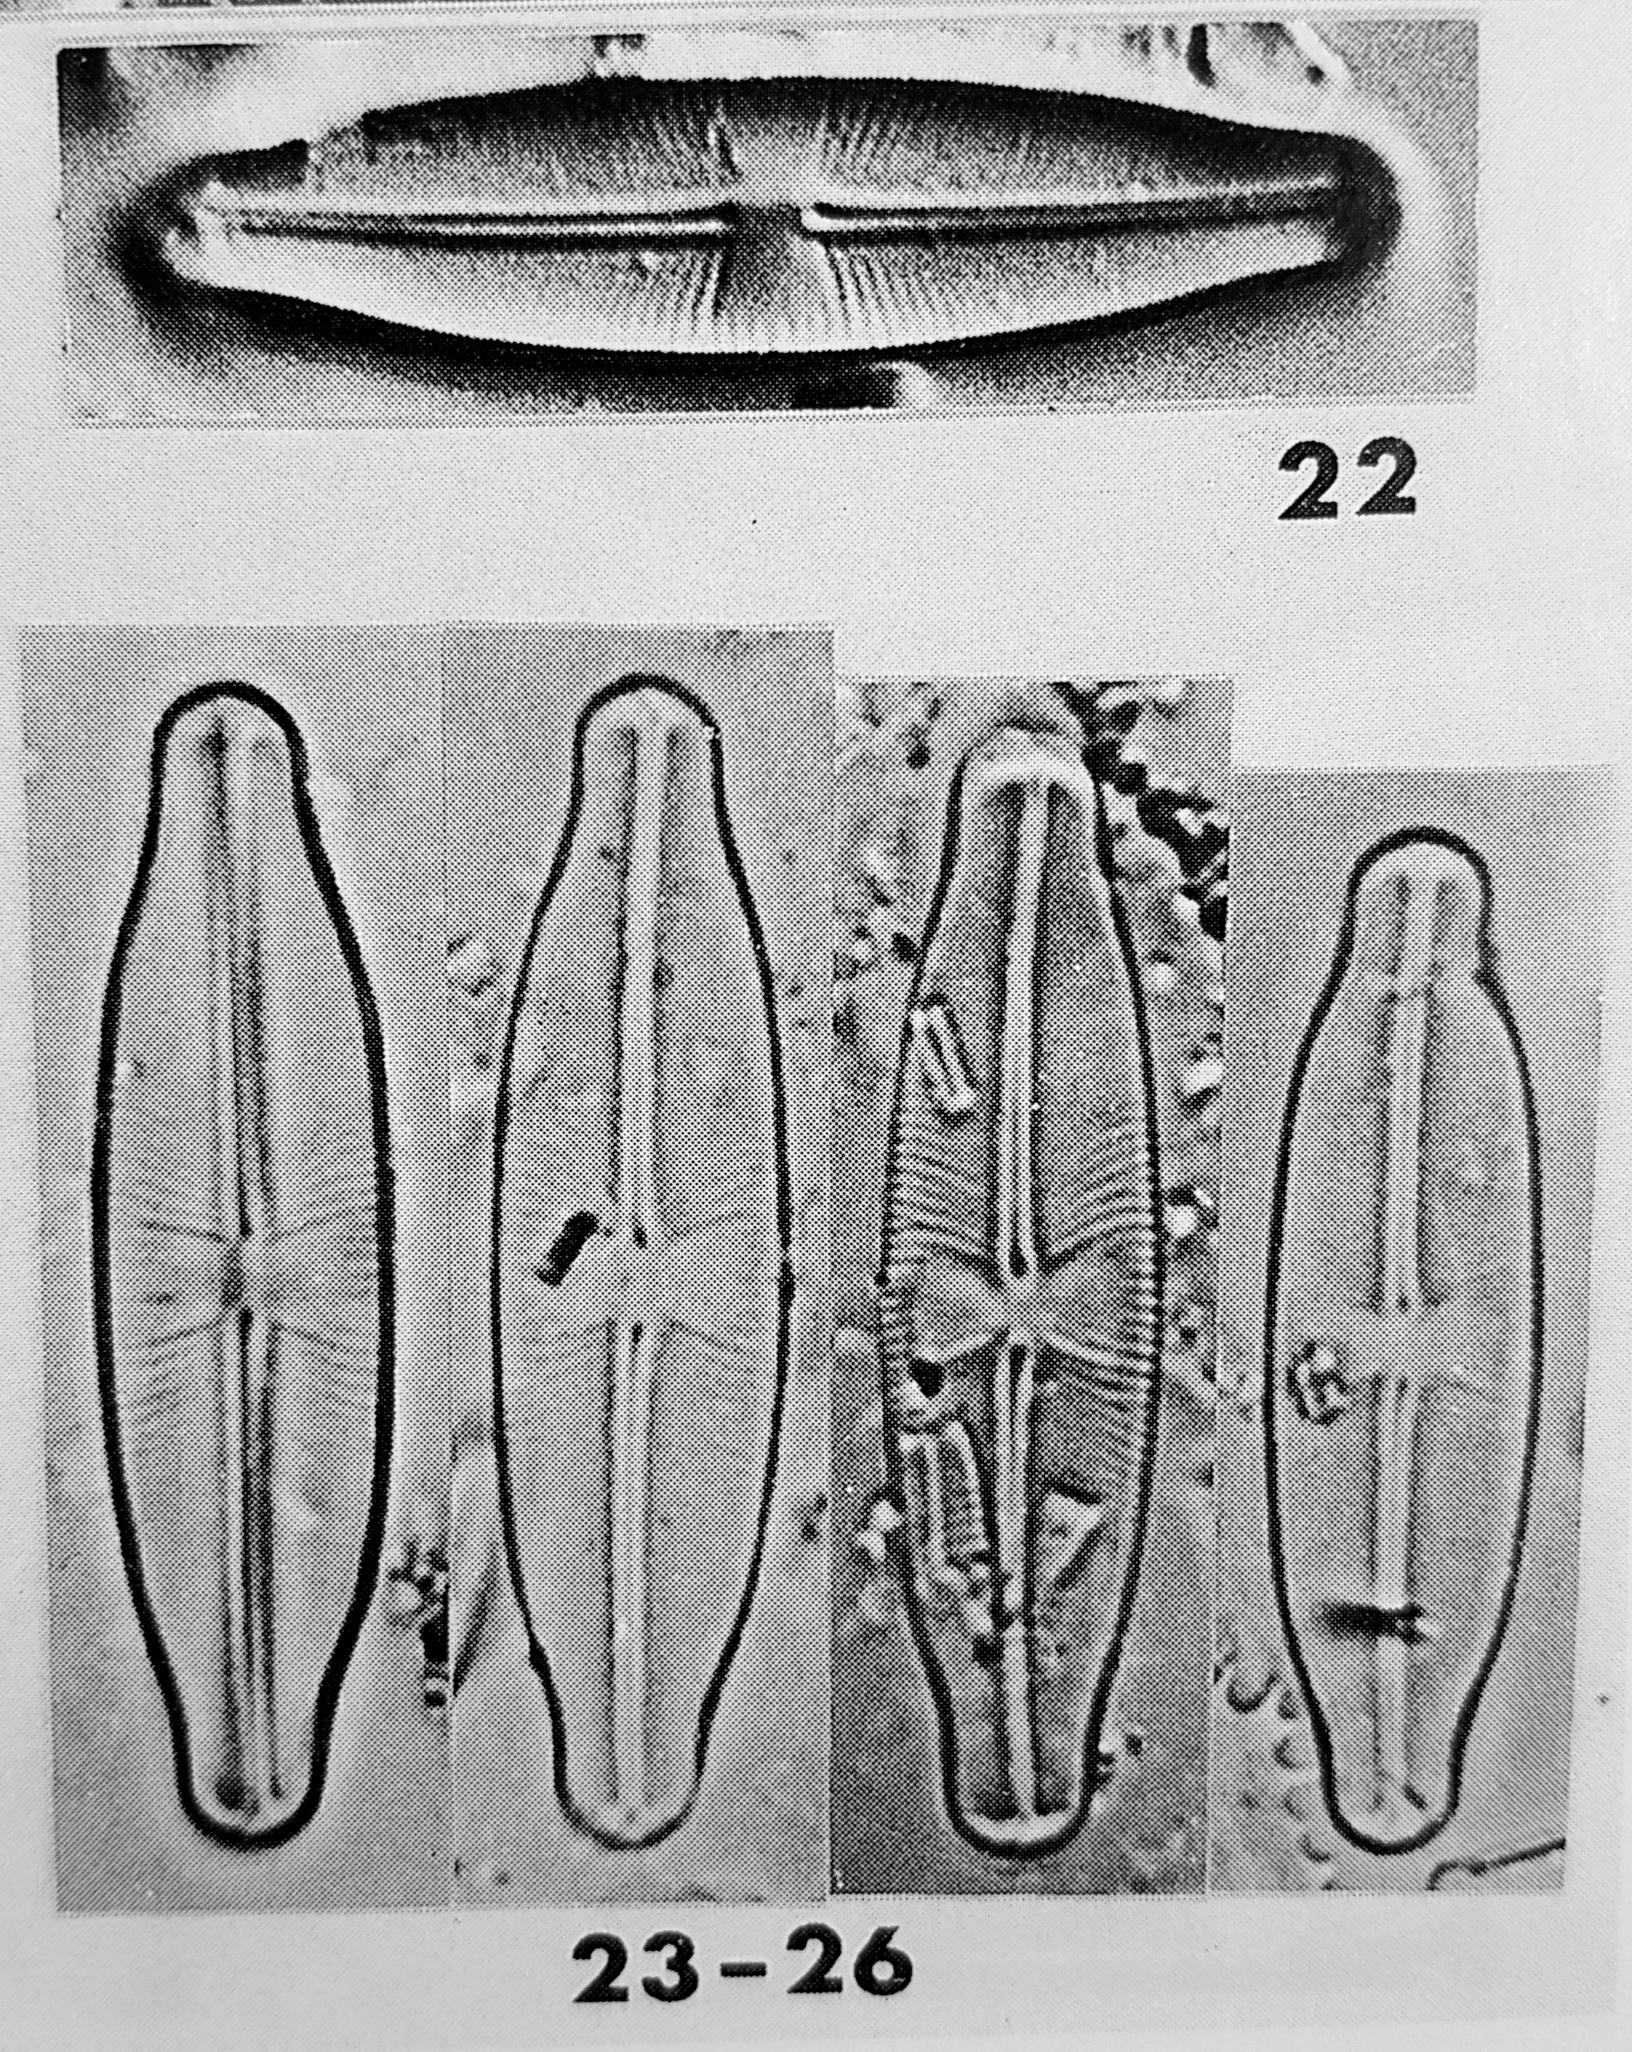 Sellaphora Stauroneioides Orig Desc Plate